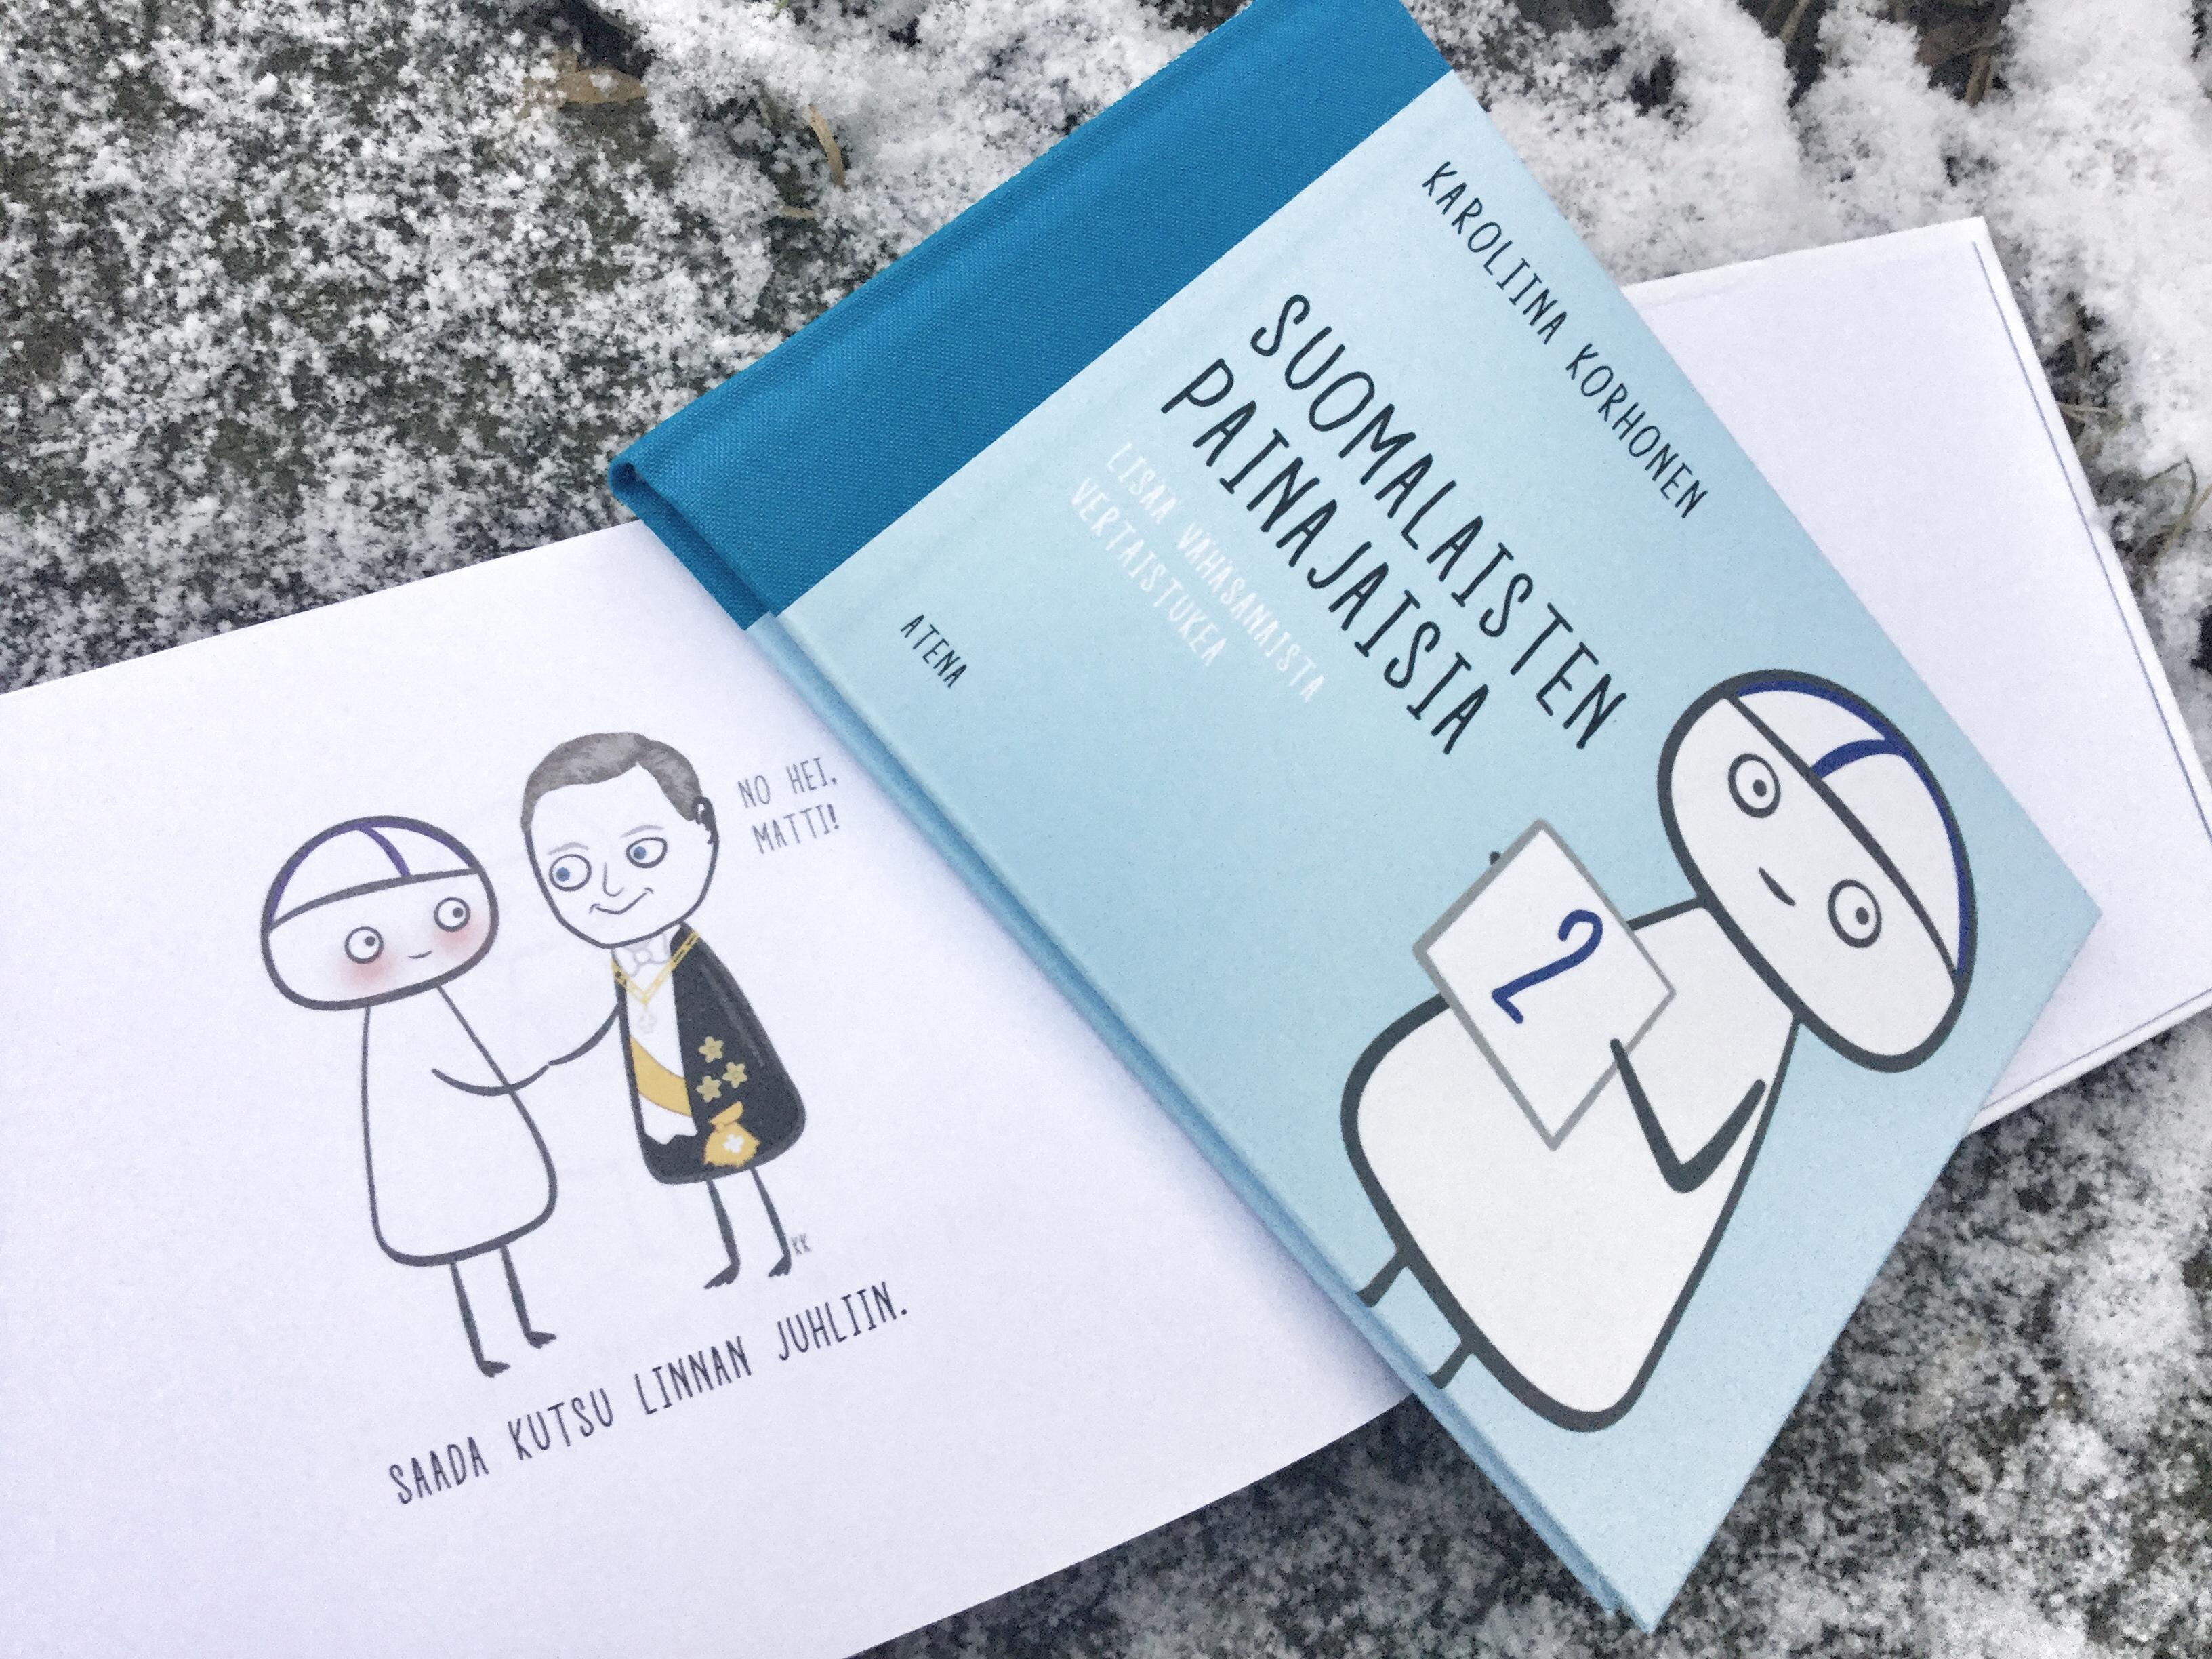 suomalaistenpainajaisia2